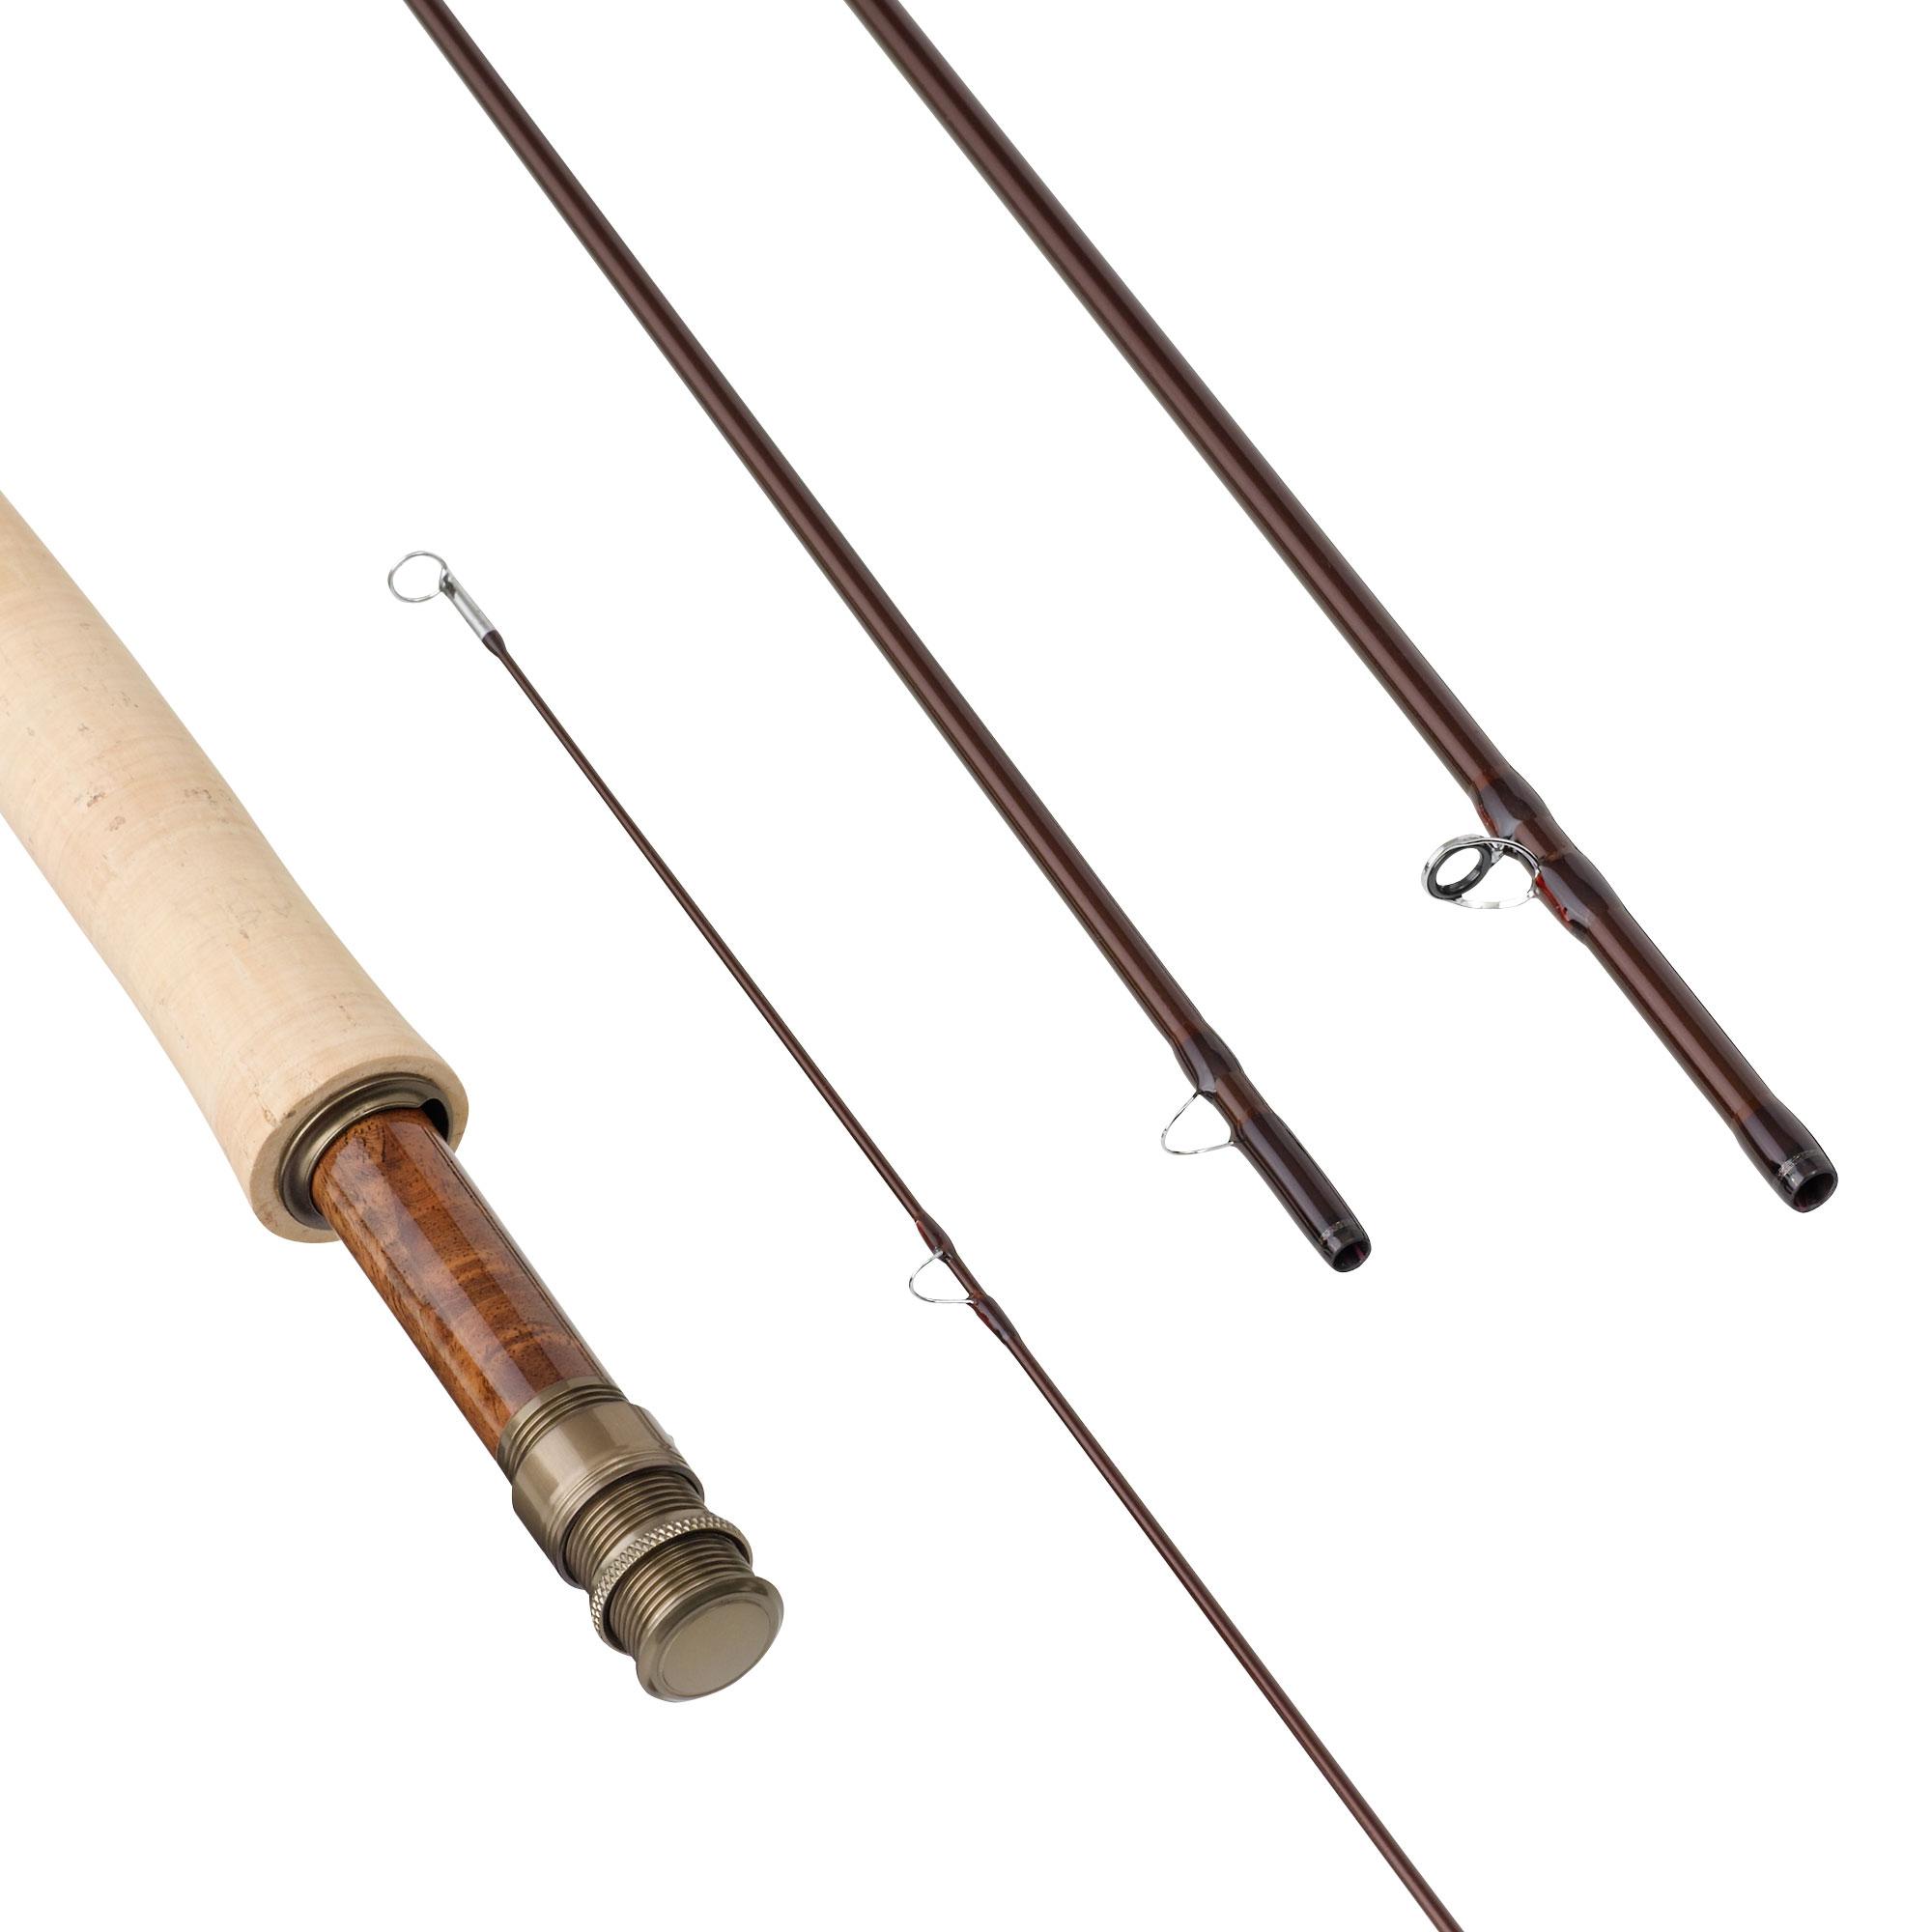 Sage TXL-F Fly Rods